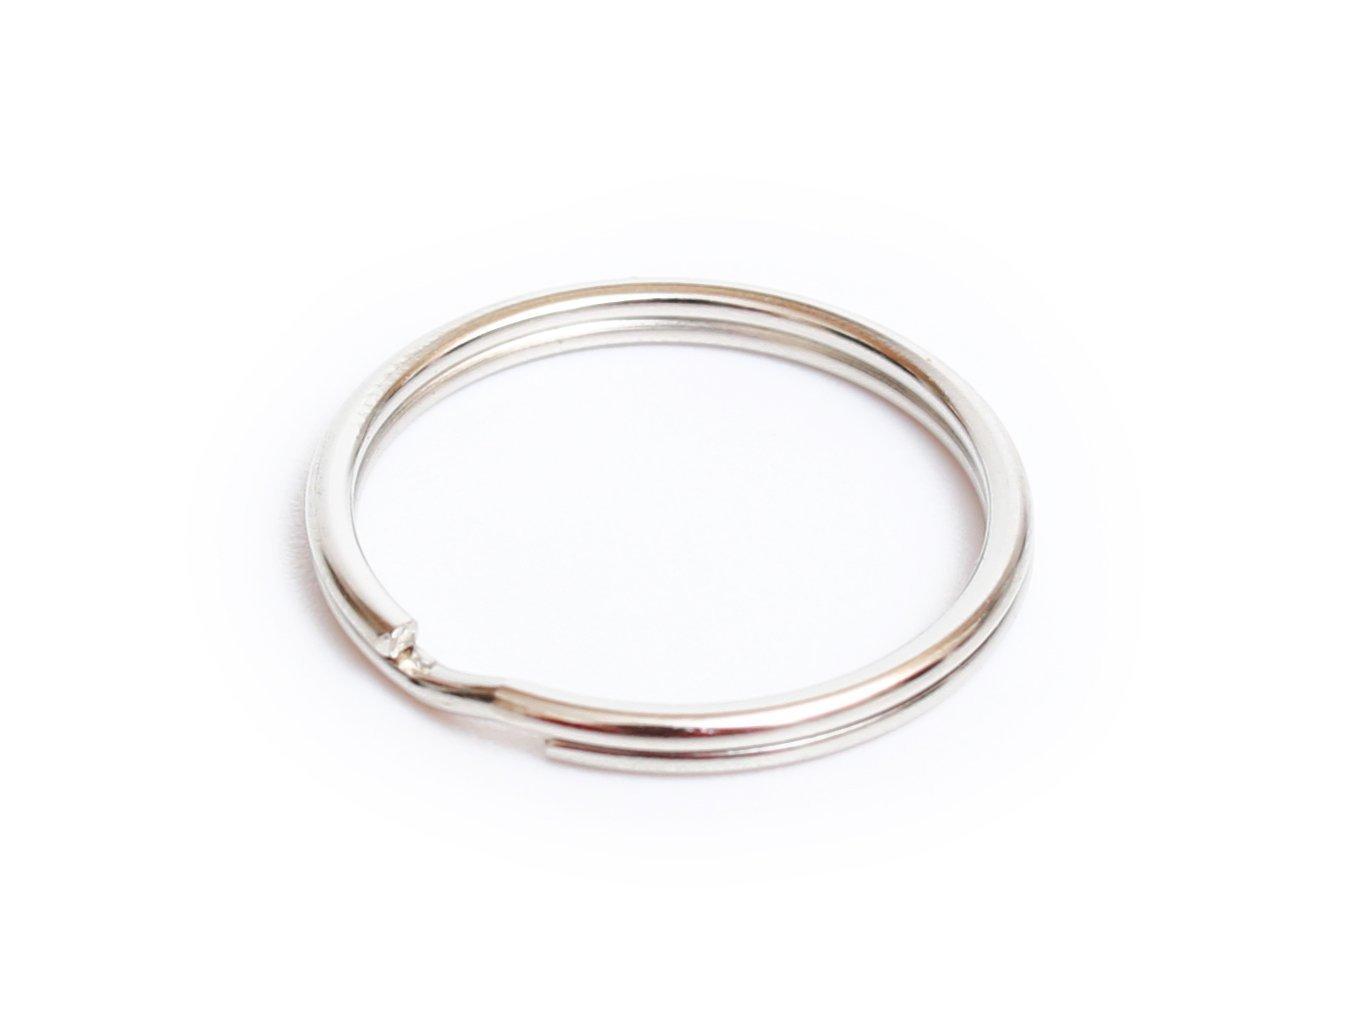 Prudance 200Pcs 1''(25mm) Nickel Plated Steel Heat Treated Lead-Free Round Edged Split Rings/Key Rings by Prudance